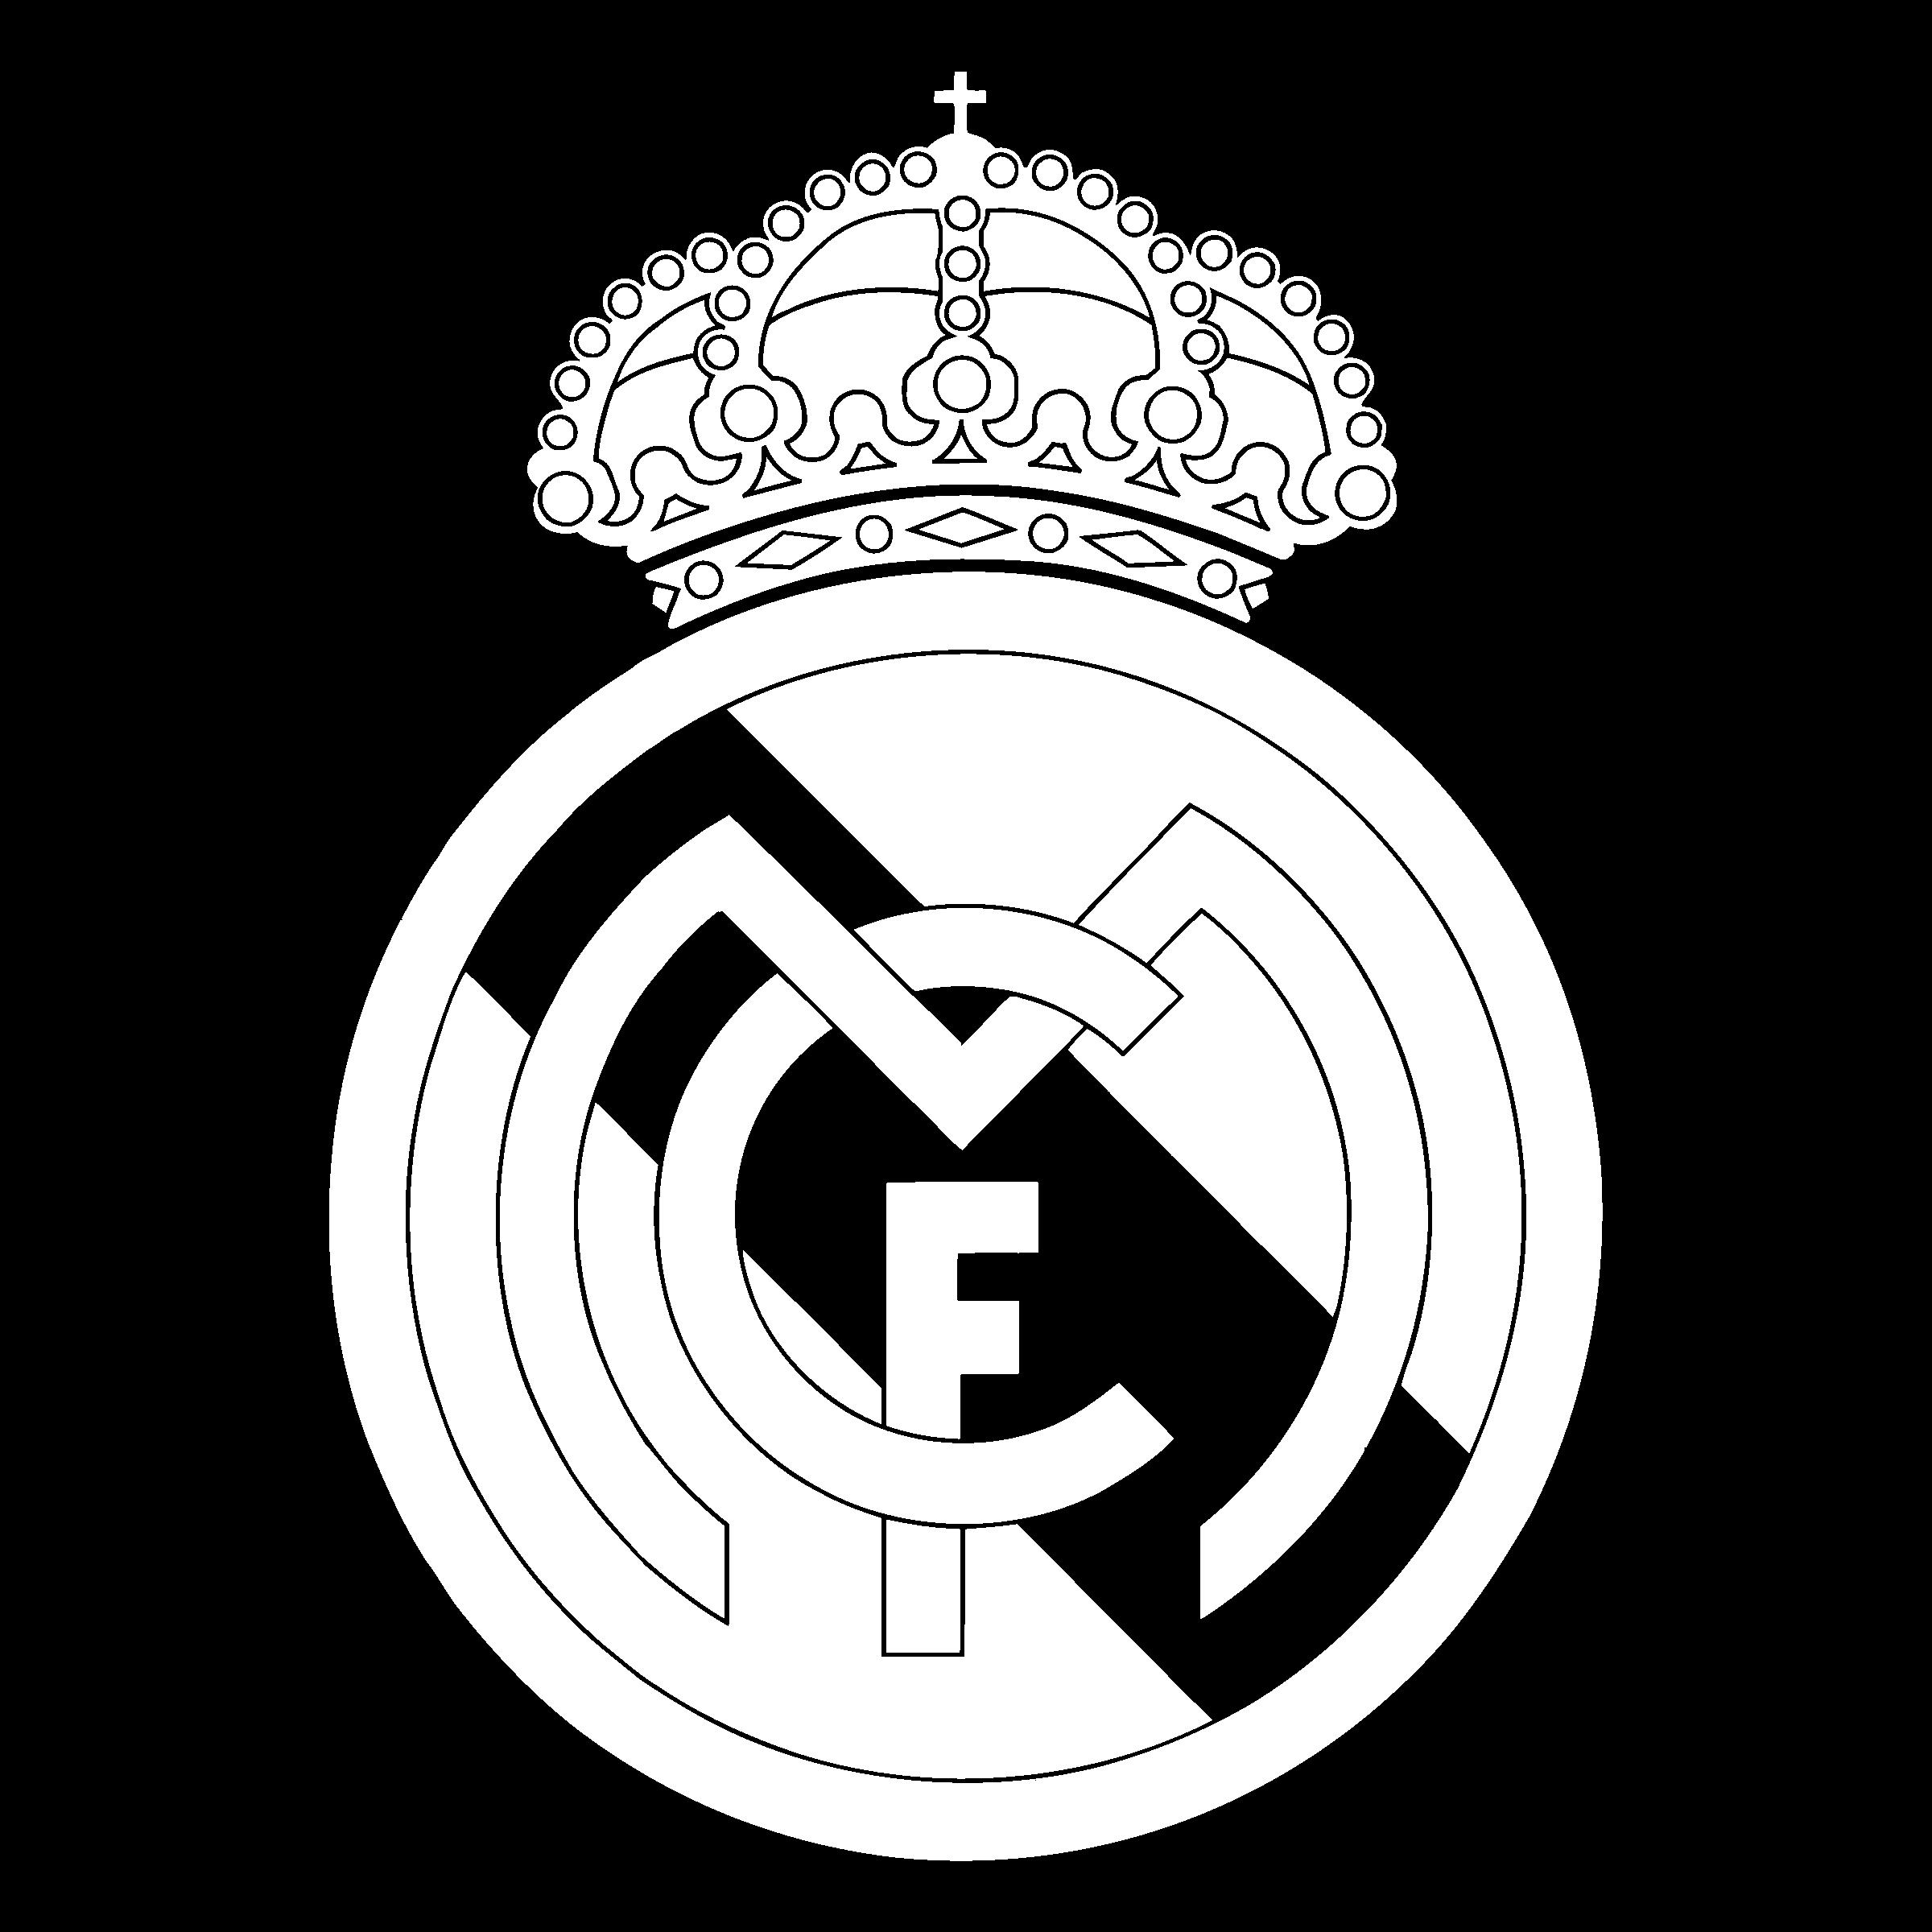 Real Madrid Cf Logo Black And White.